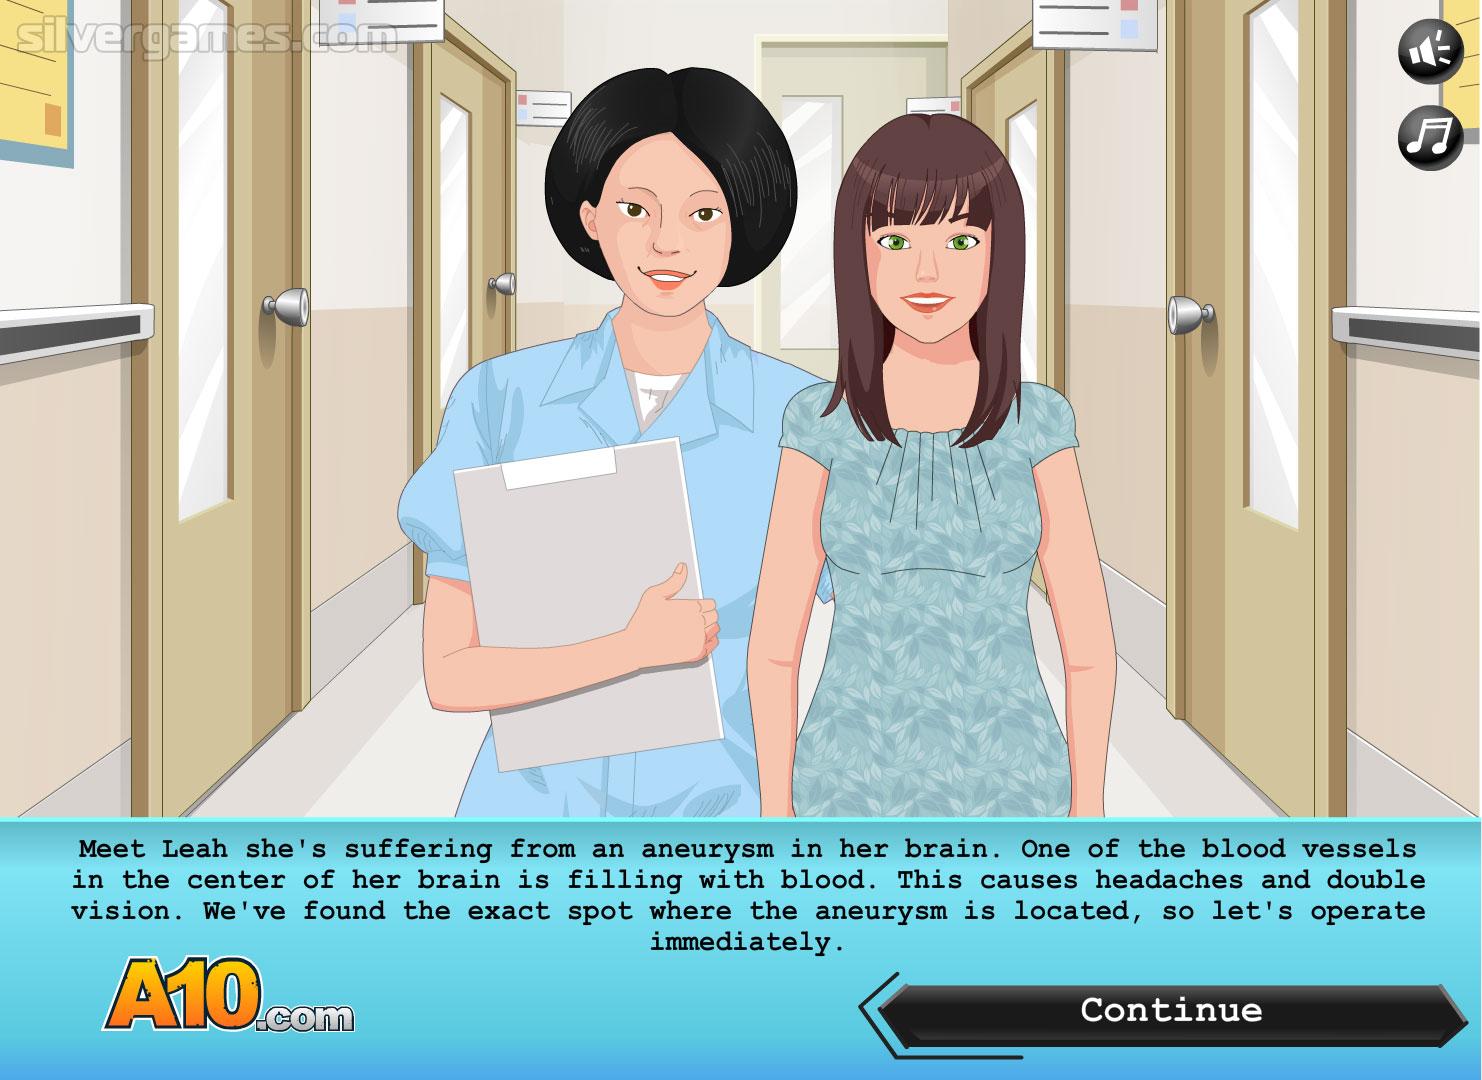 Operations Spiele Online